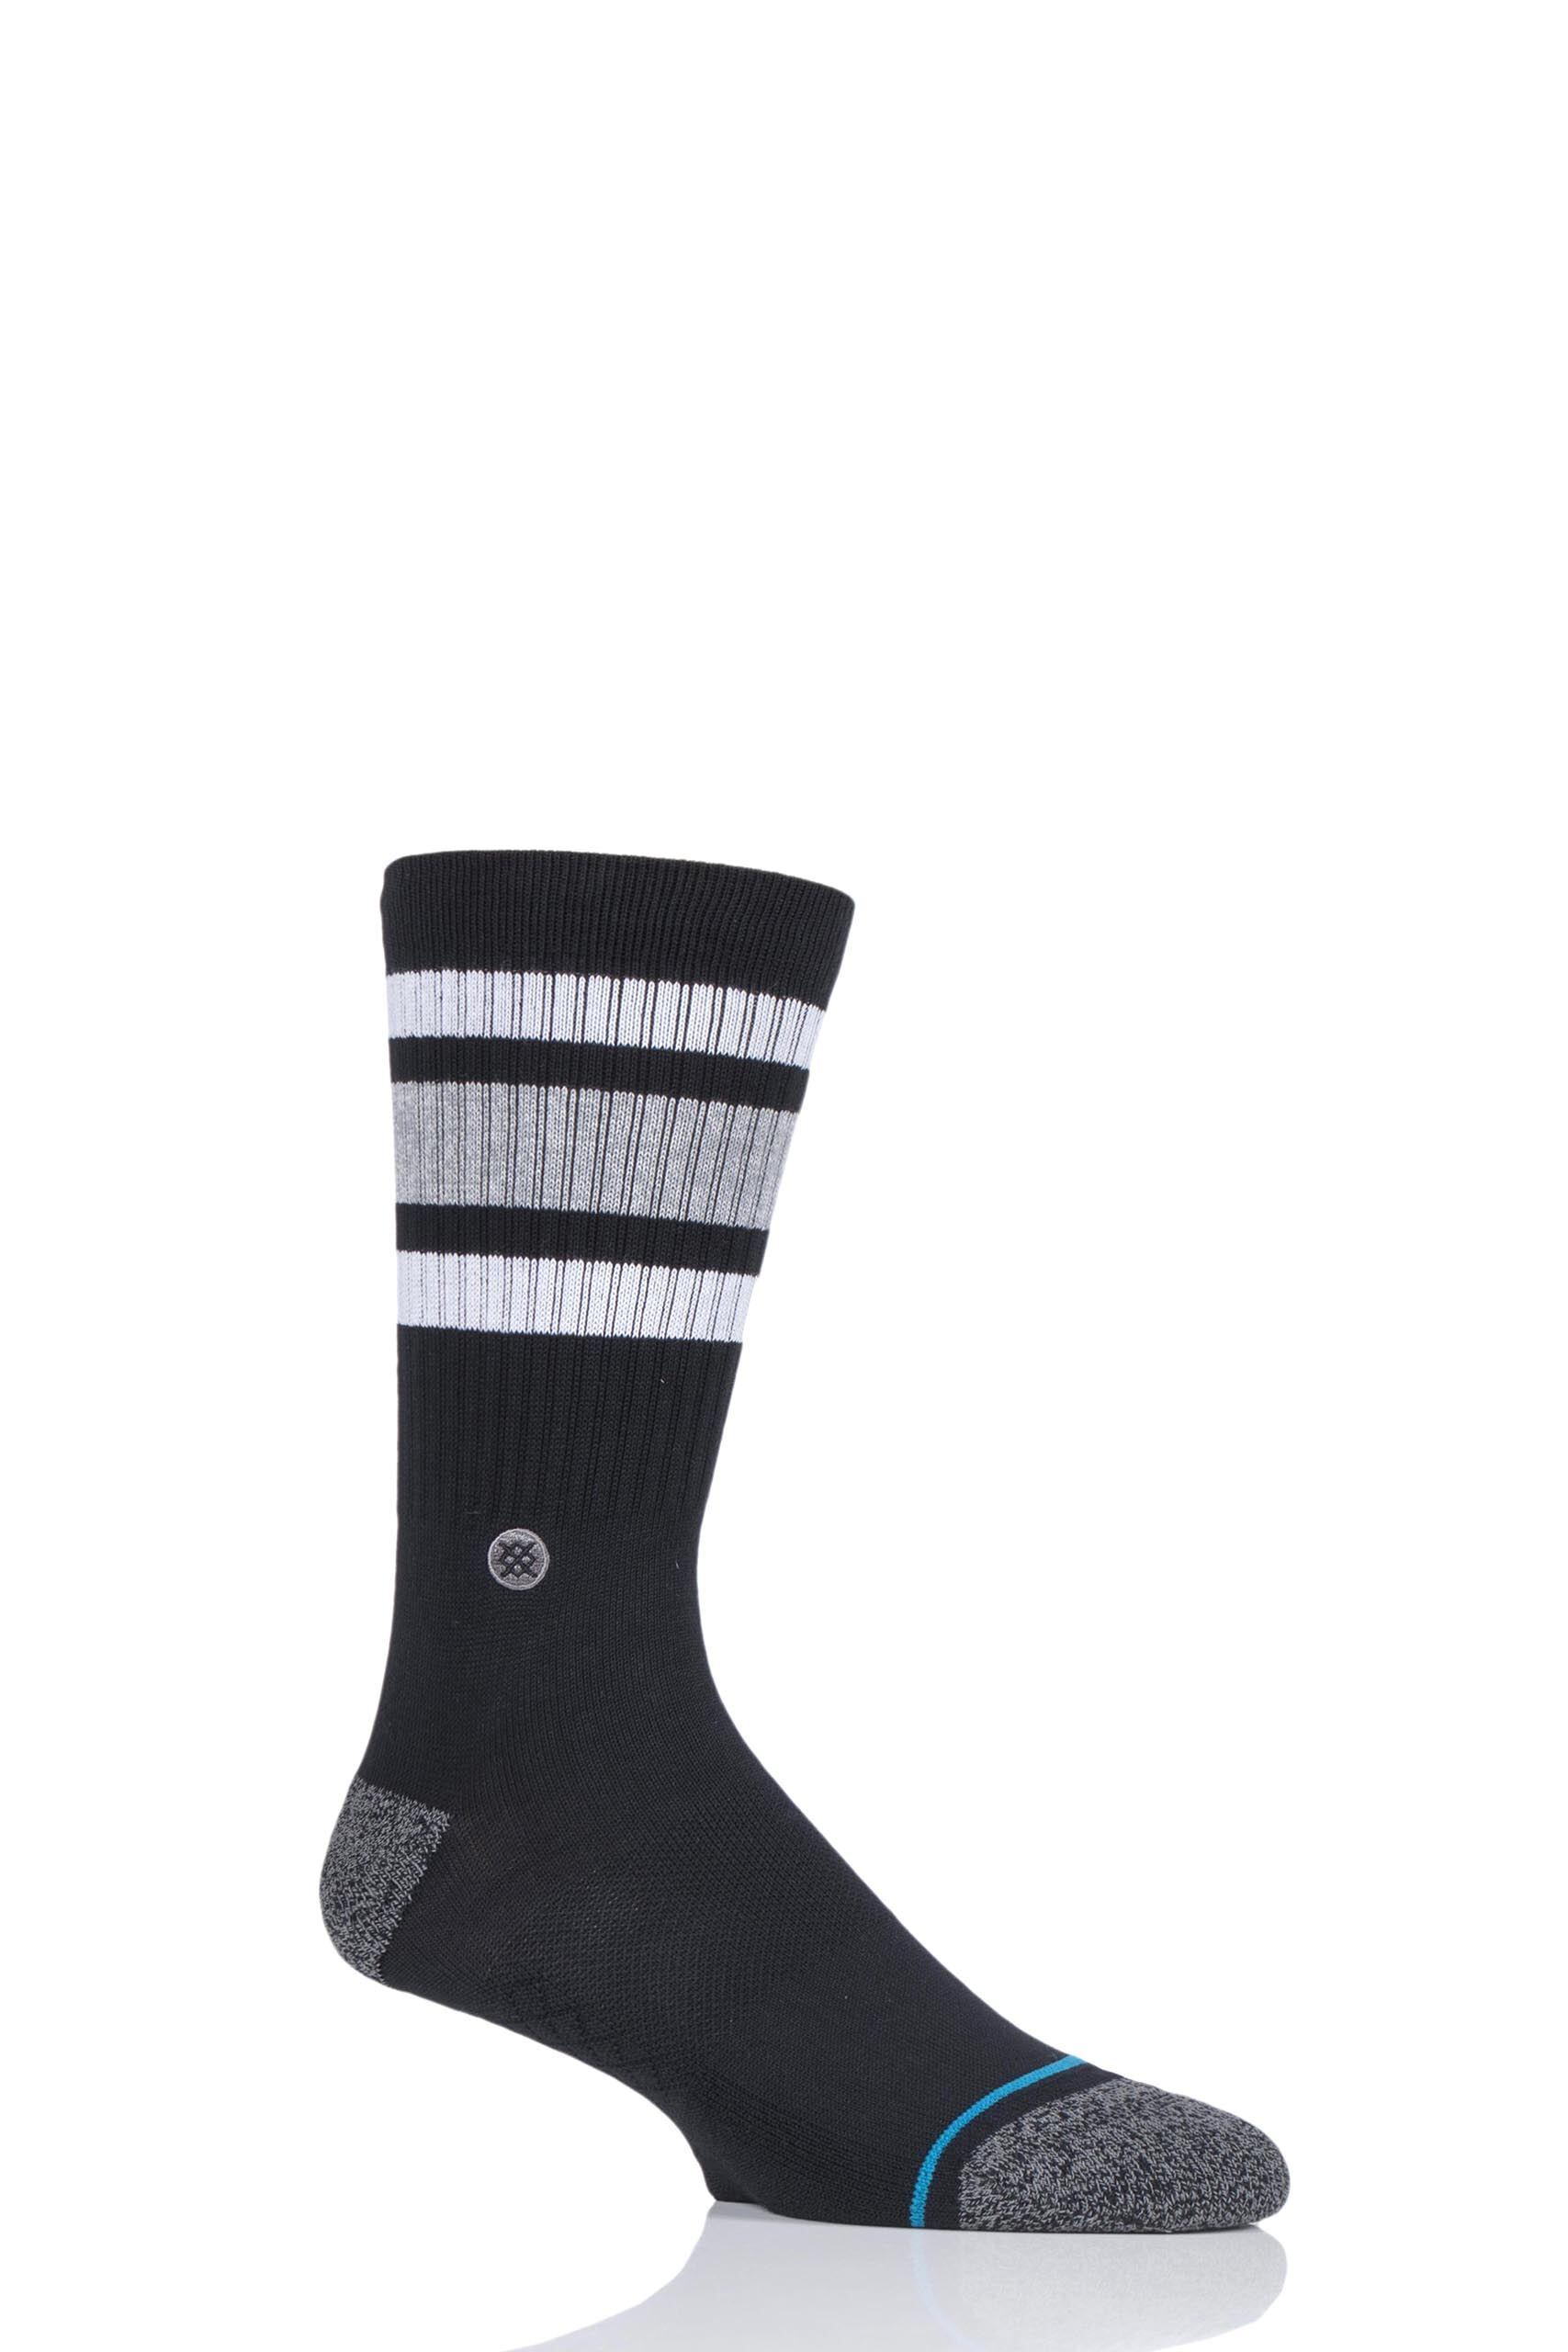 Image of 1 Pair Black Boyd St Cotton Socks Unisex 5.5-8 Mens - Stance